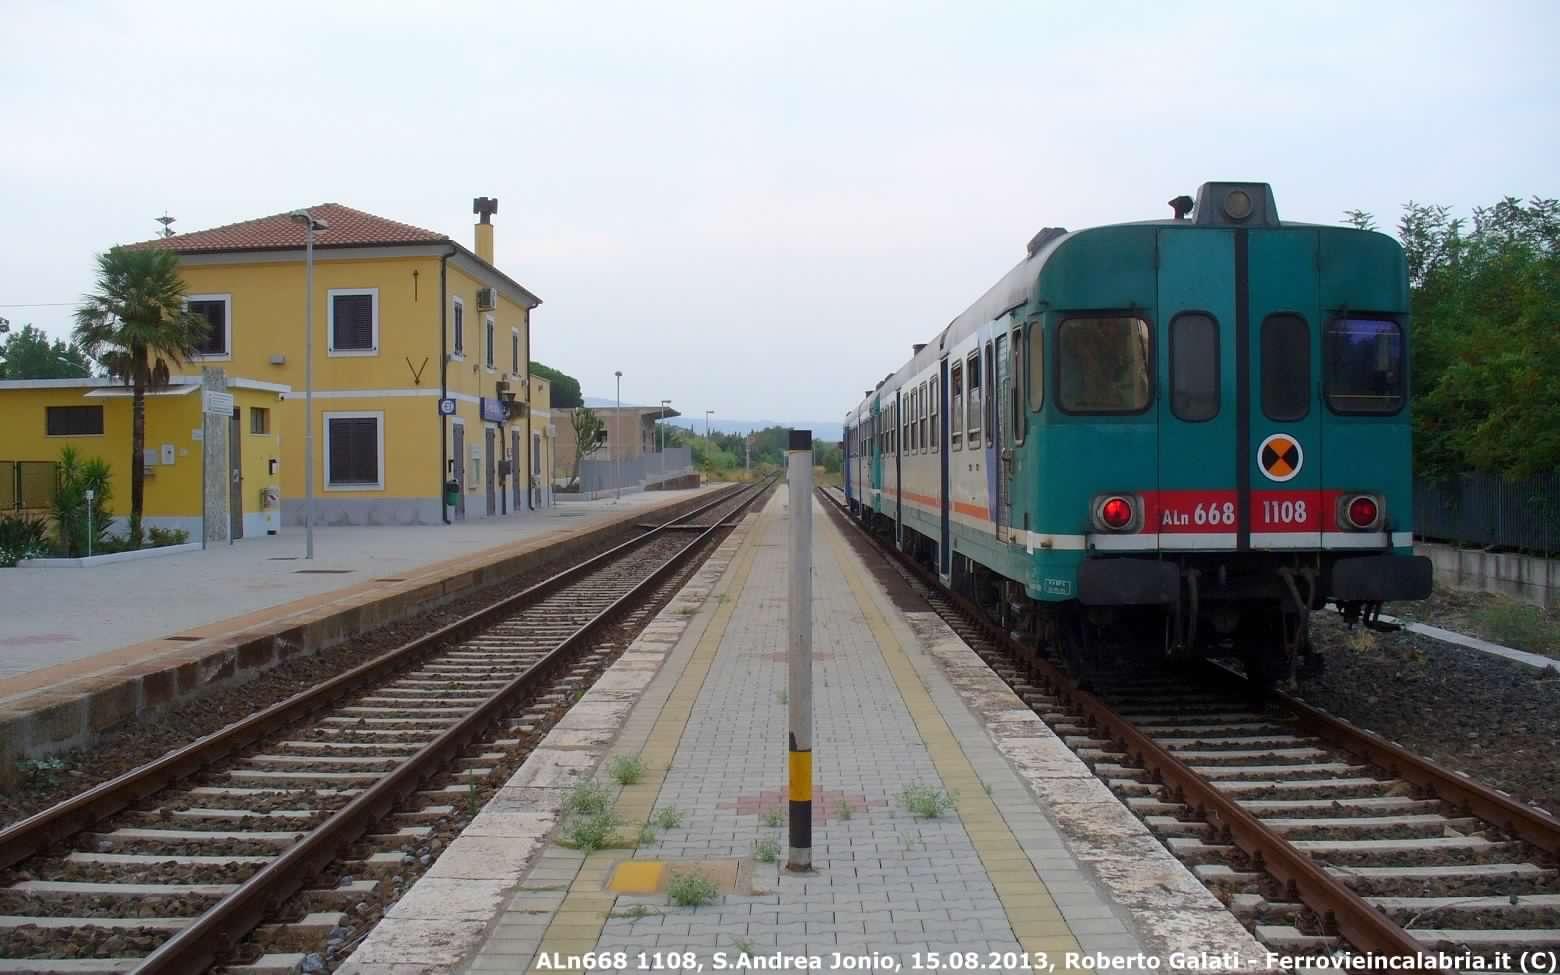 ALn668 1108-Reg8526-S.Andrea Jonio-2013-08-15-RobertoGalati